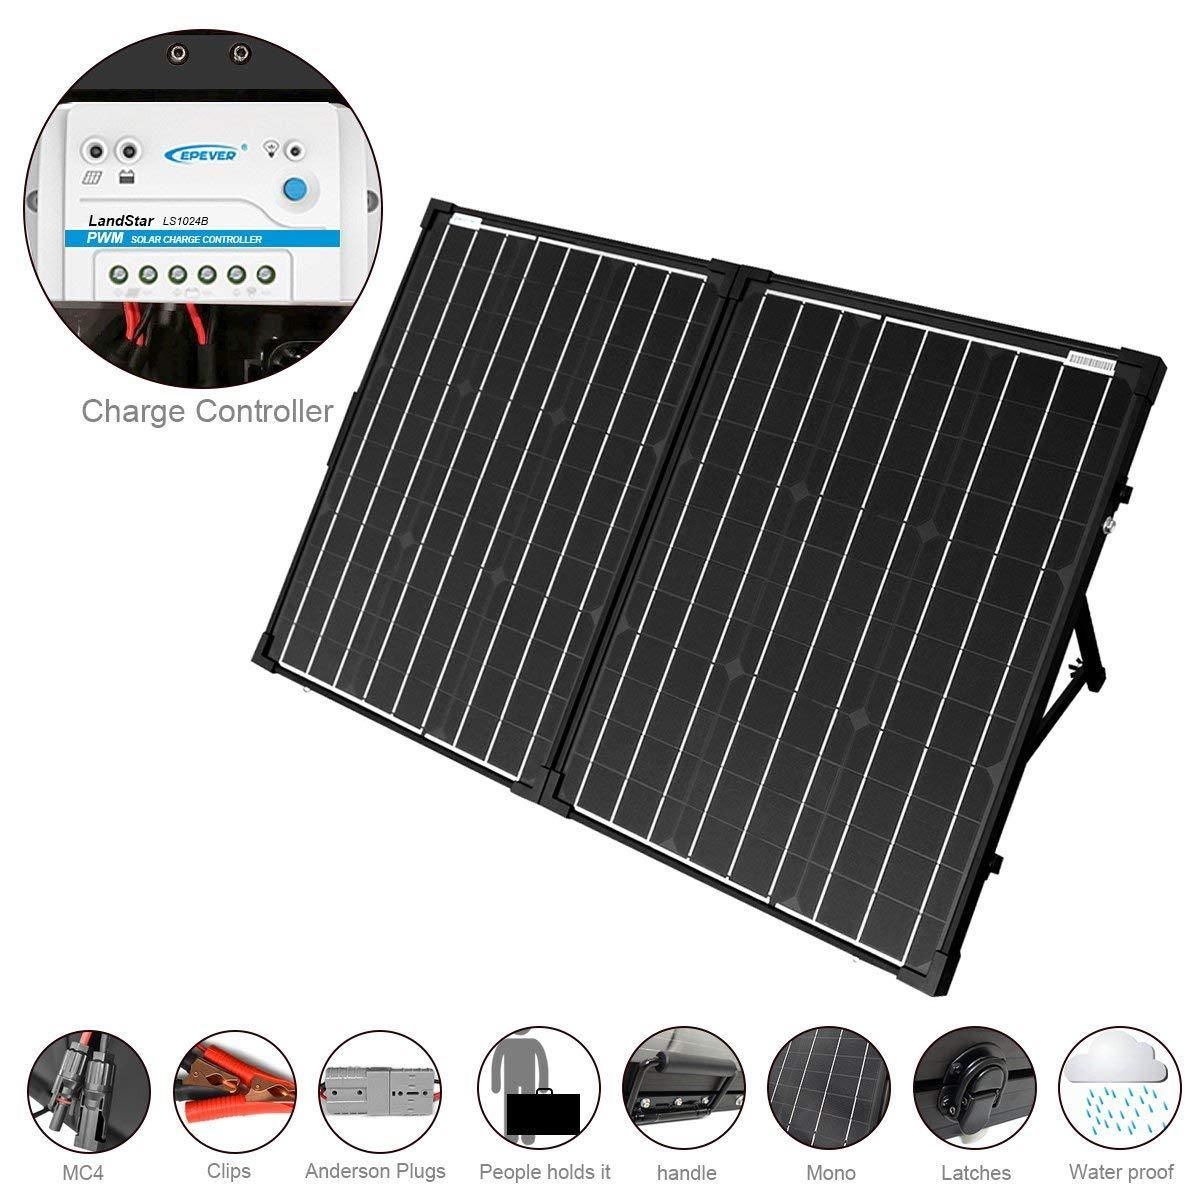 7c7cc1c5c486 ACOPOWER UV11007GD 100W Foldable Solar Panel Kit, 12V Battery and ...